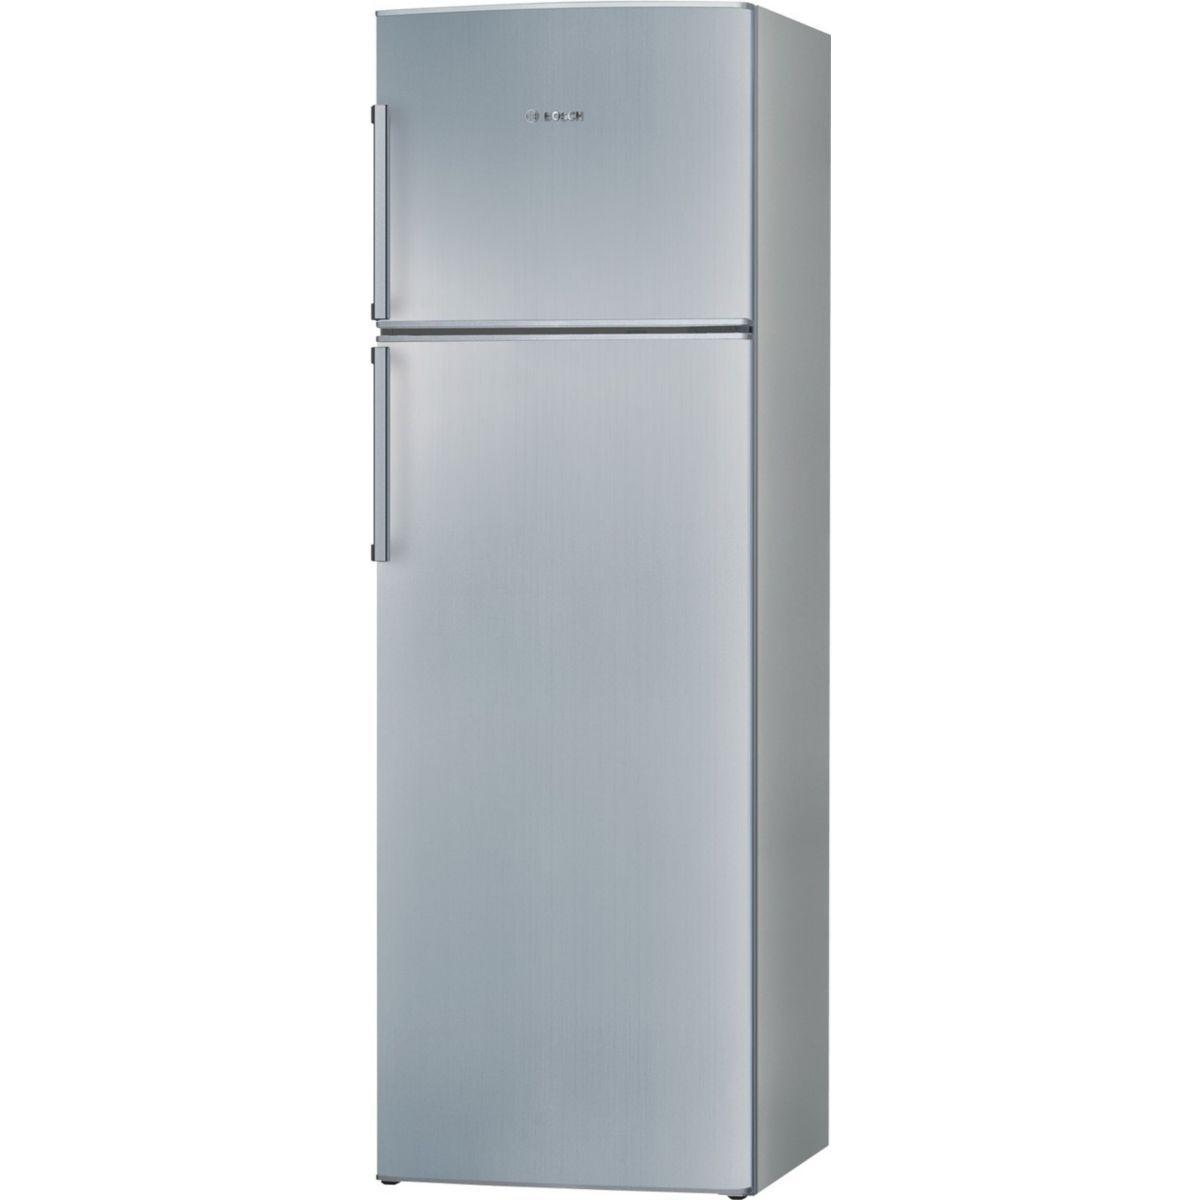 Réfrigérateur 2 portes BOSCH KDN 32 X 45